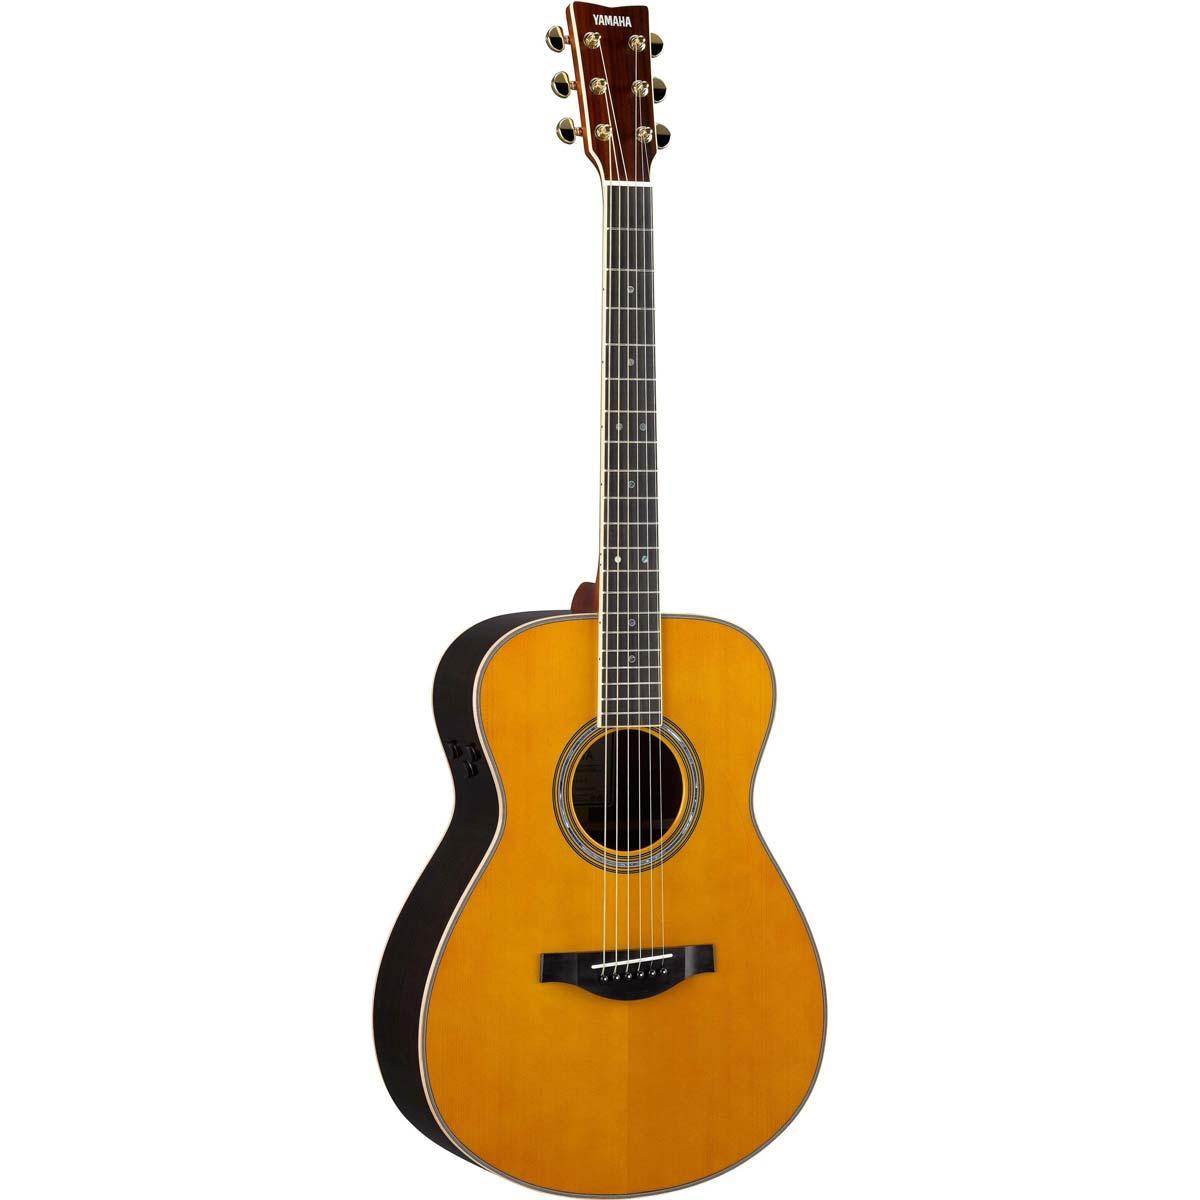 Yamaha LS-TAVT transacousticwestern-guitar vintage tint